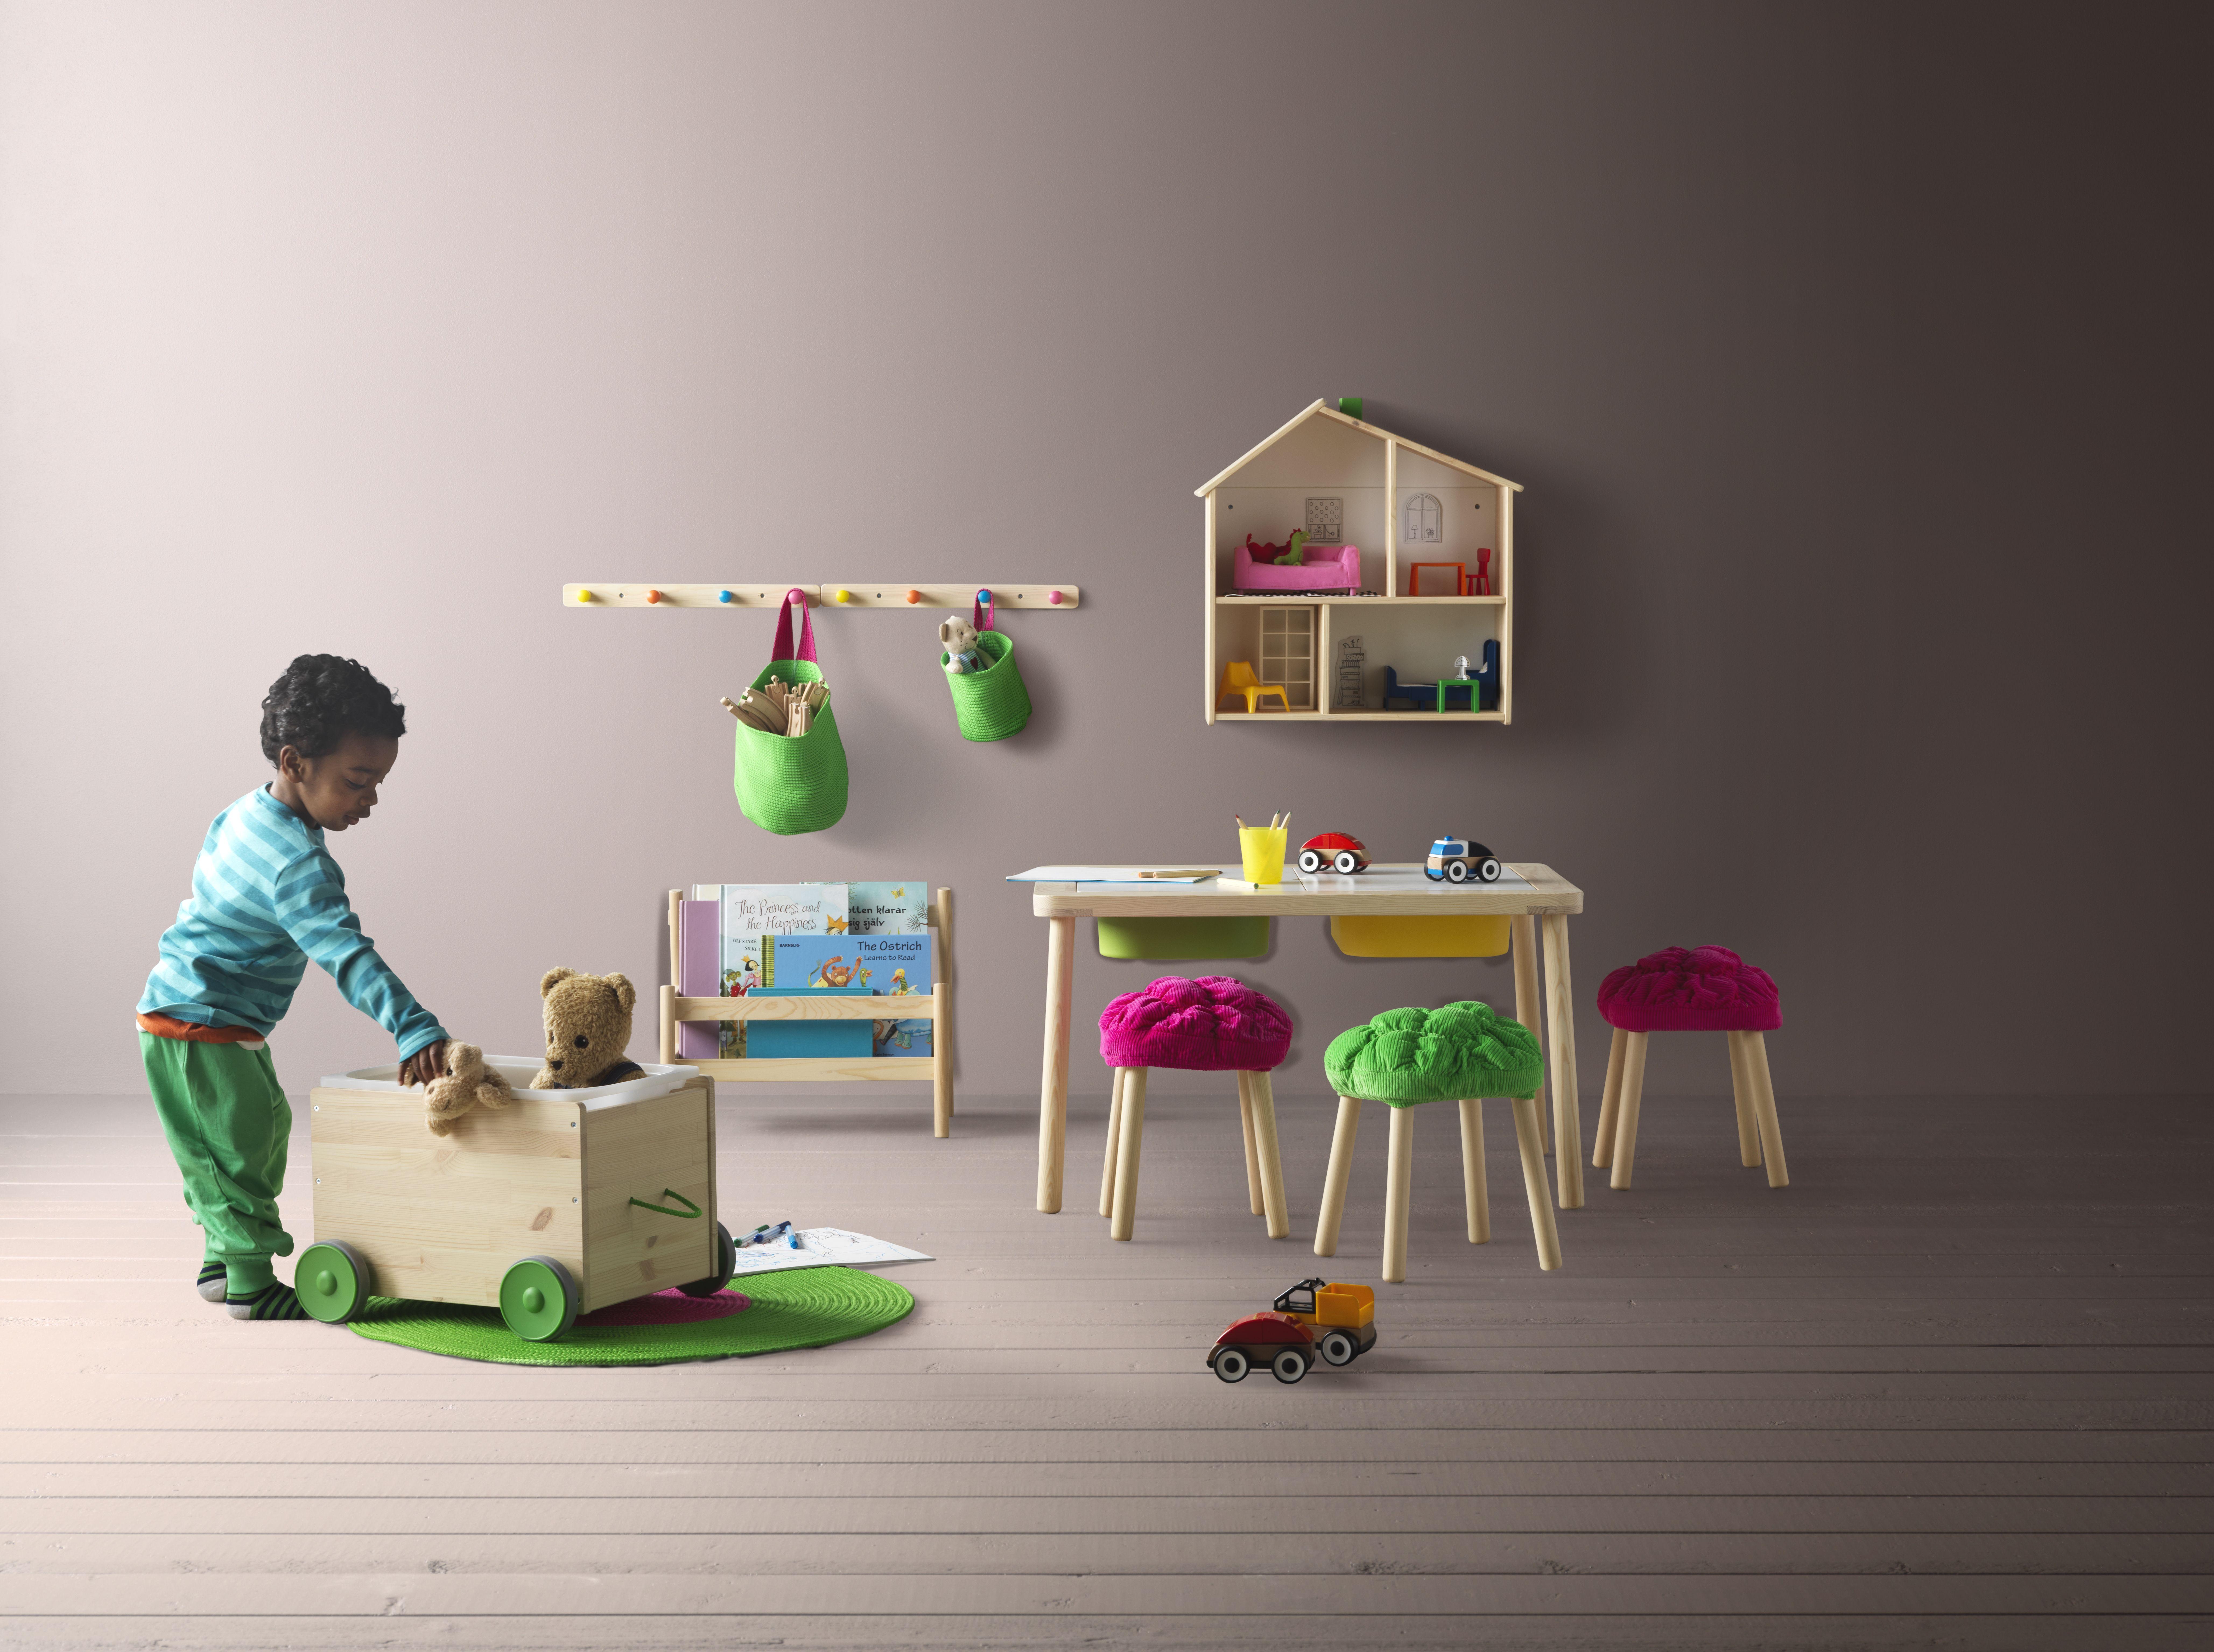 soggiorni ikea besta ~ 91 best ikea besta images on pinterest - Soggiorno Ikea Besta Tofta